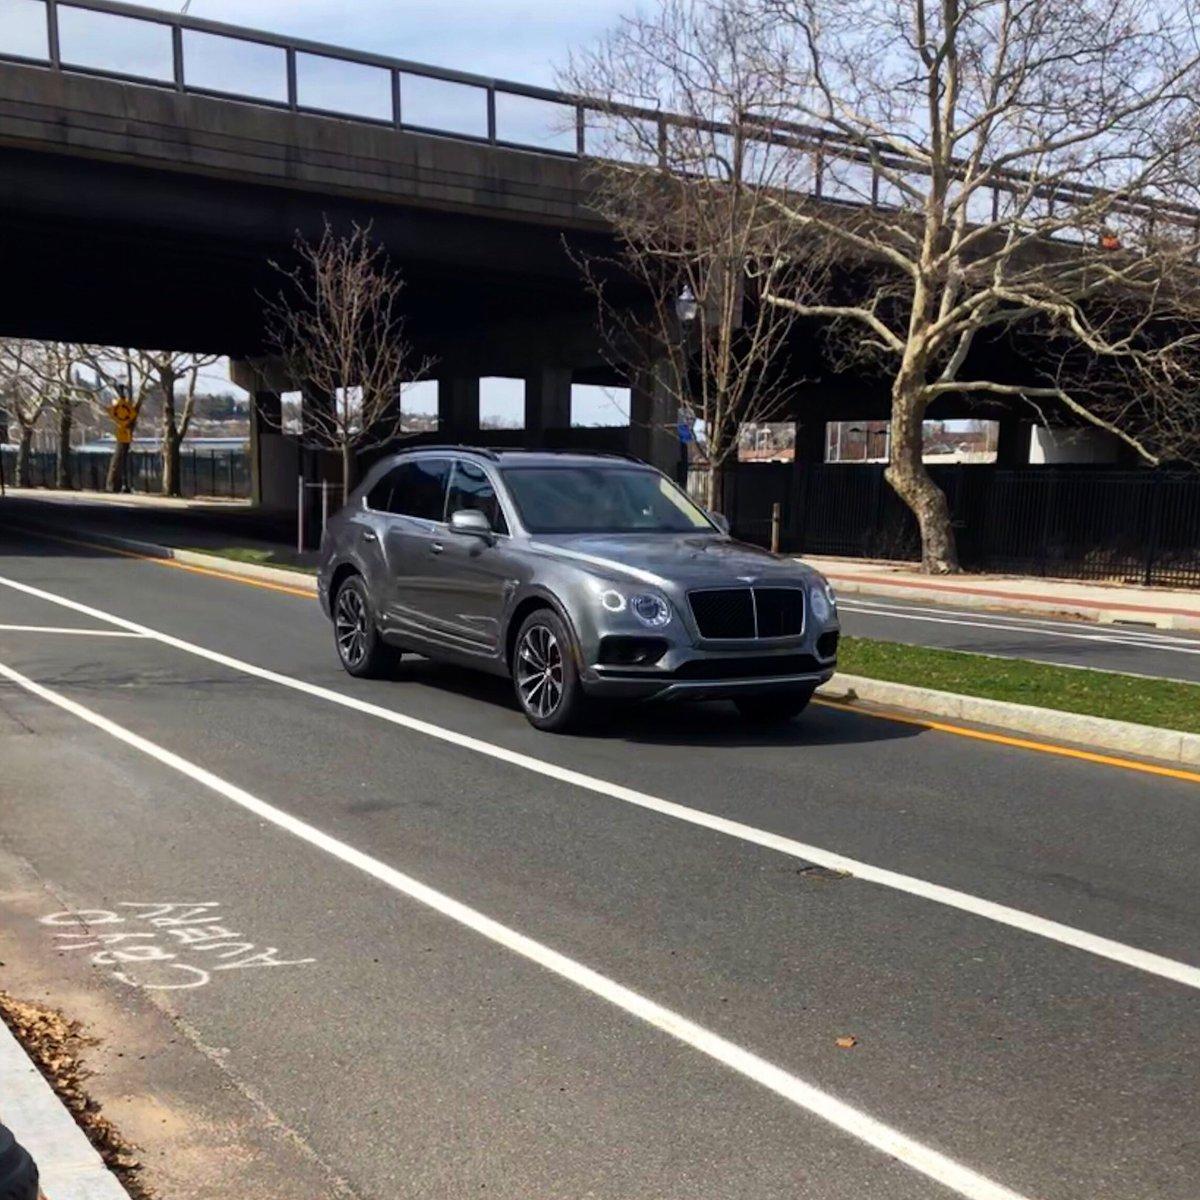 Found a Bentley Bentayga on my way to class. What a beautiful car 😍 @BentleyMotors